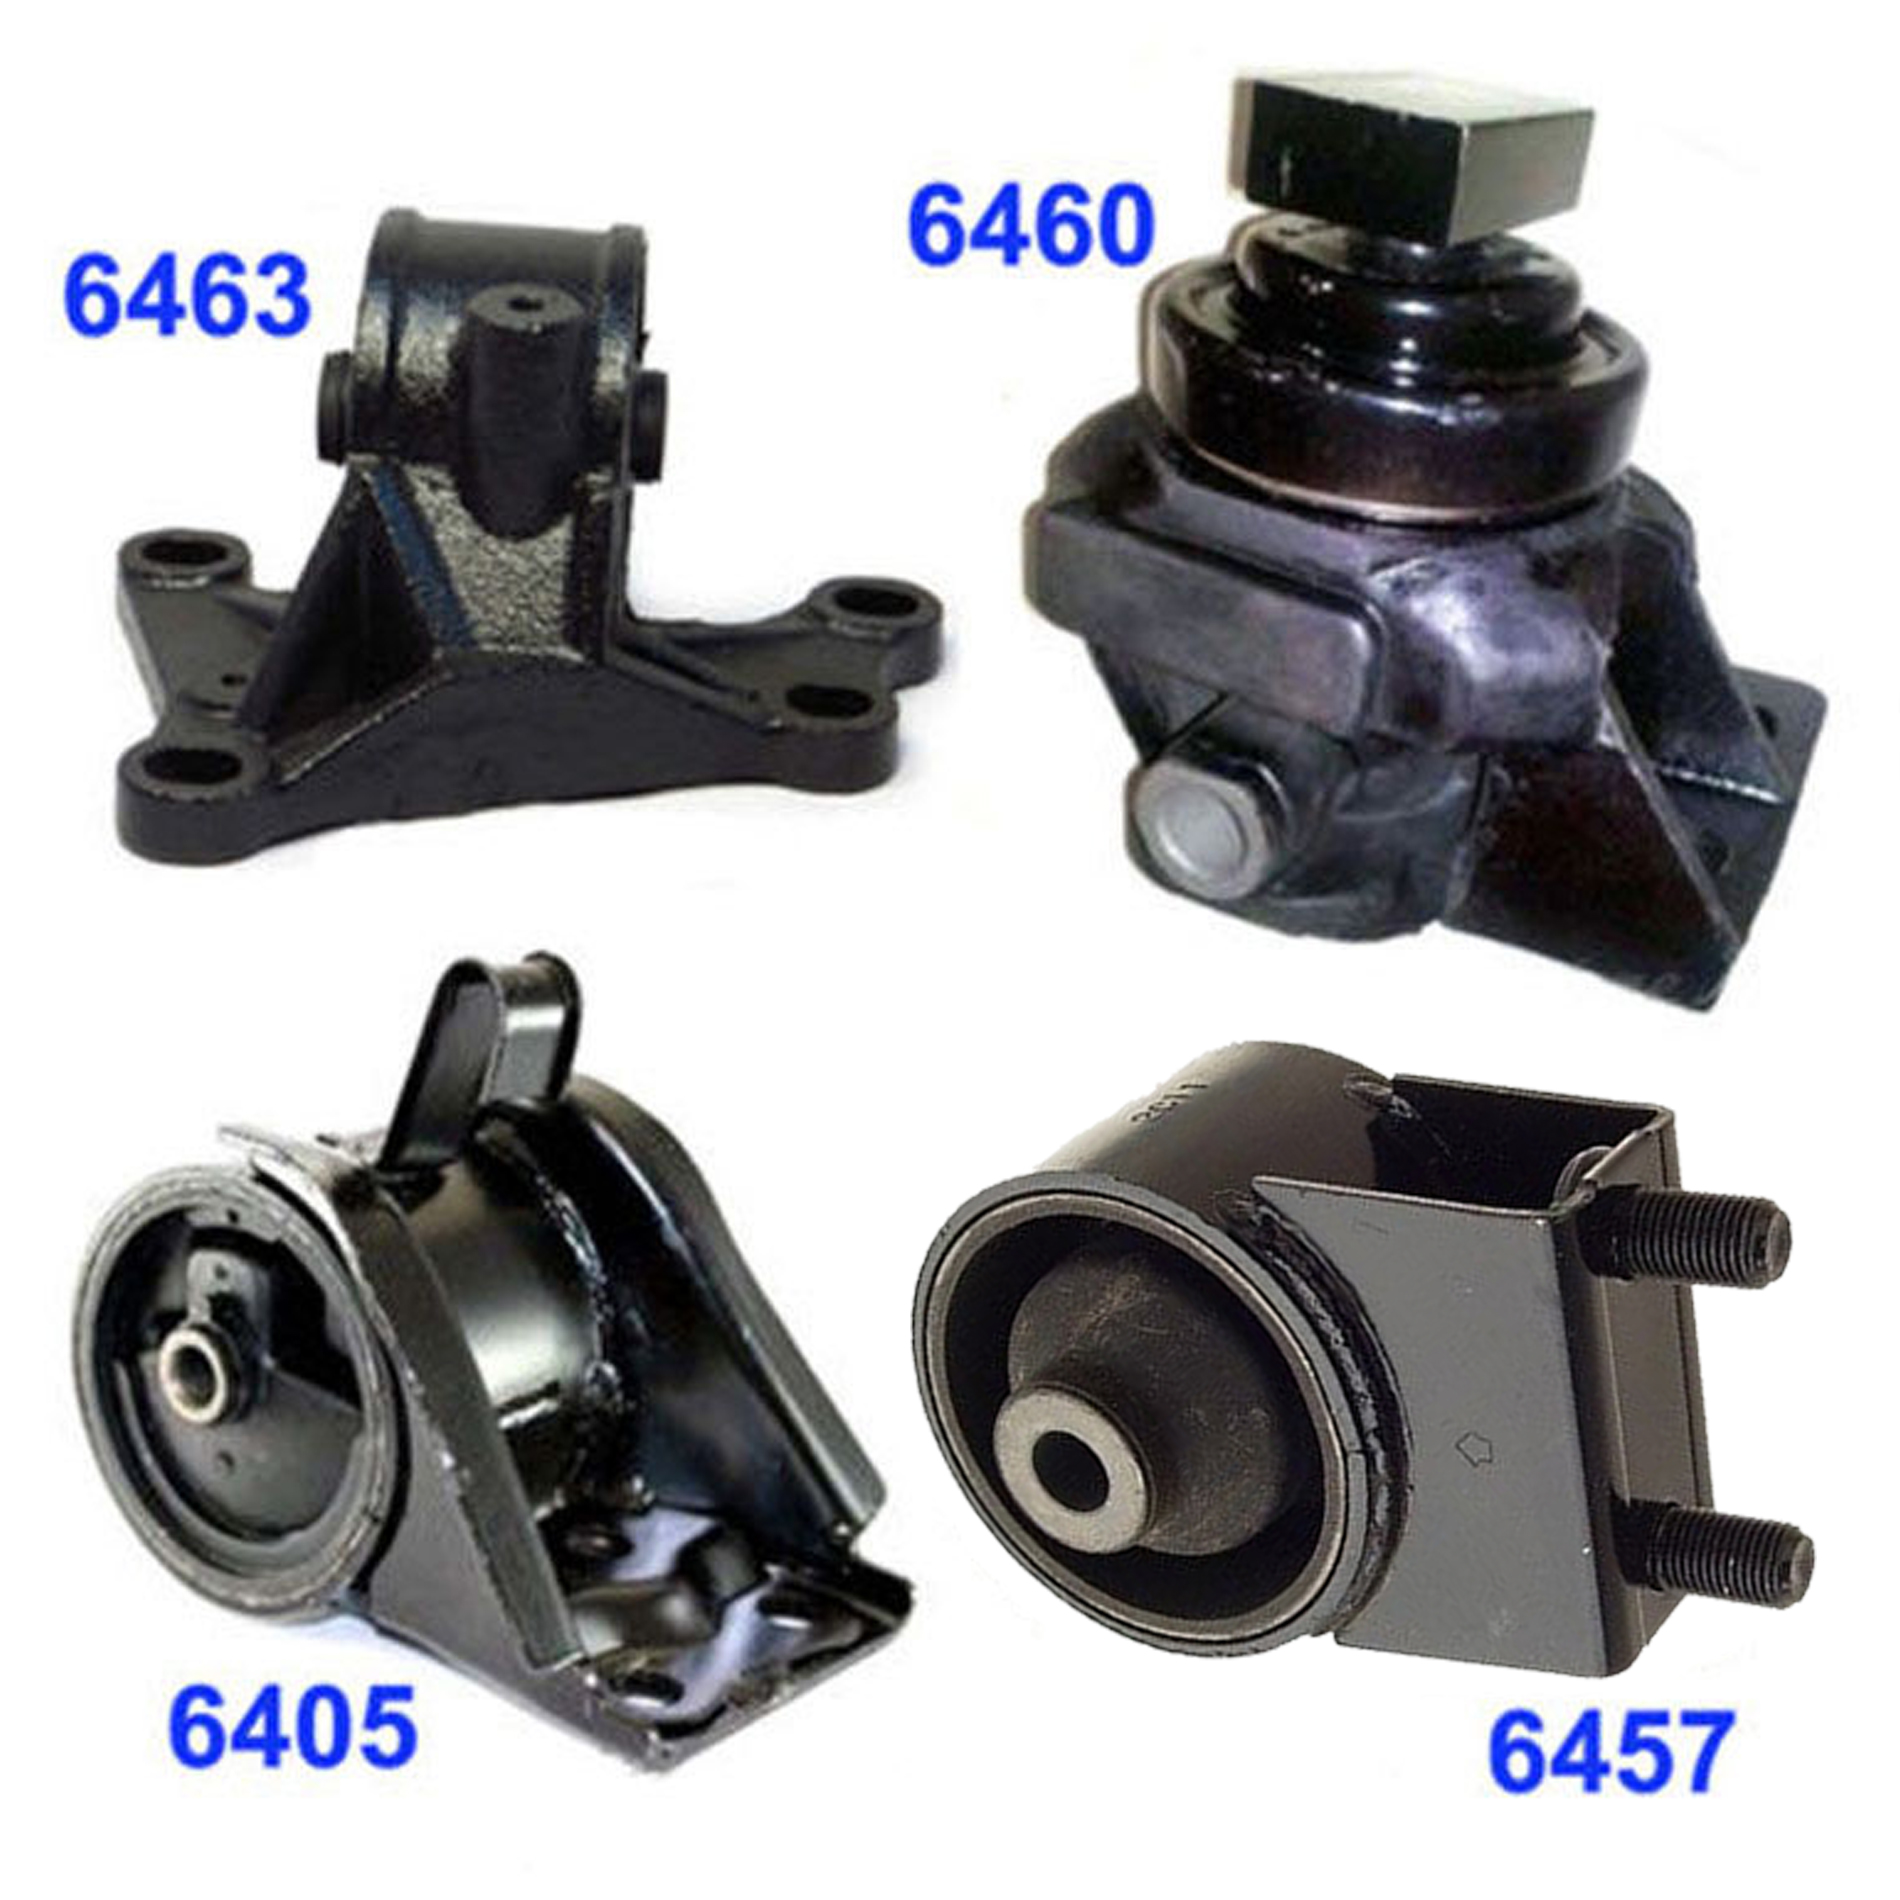 1994-1999 Mazda 626 2.0 Engine Motor /& Trans Mount Set 4PCS for Auto Trans M1017